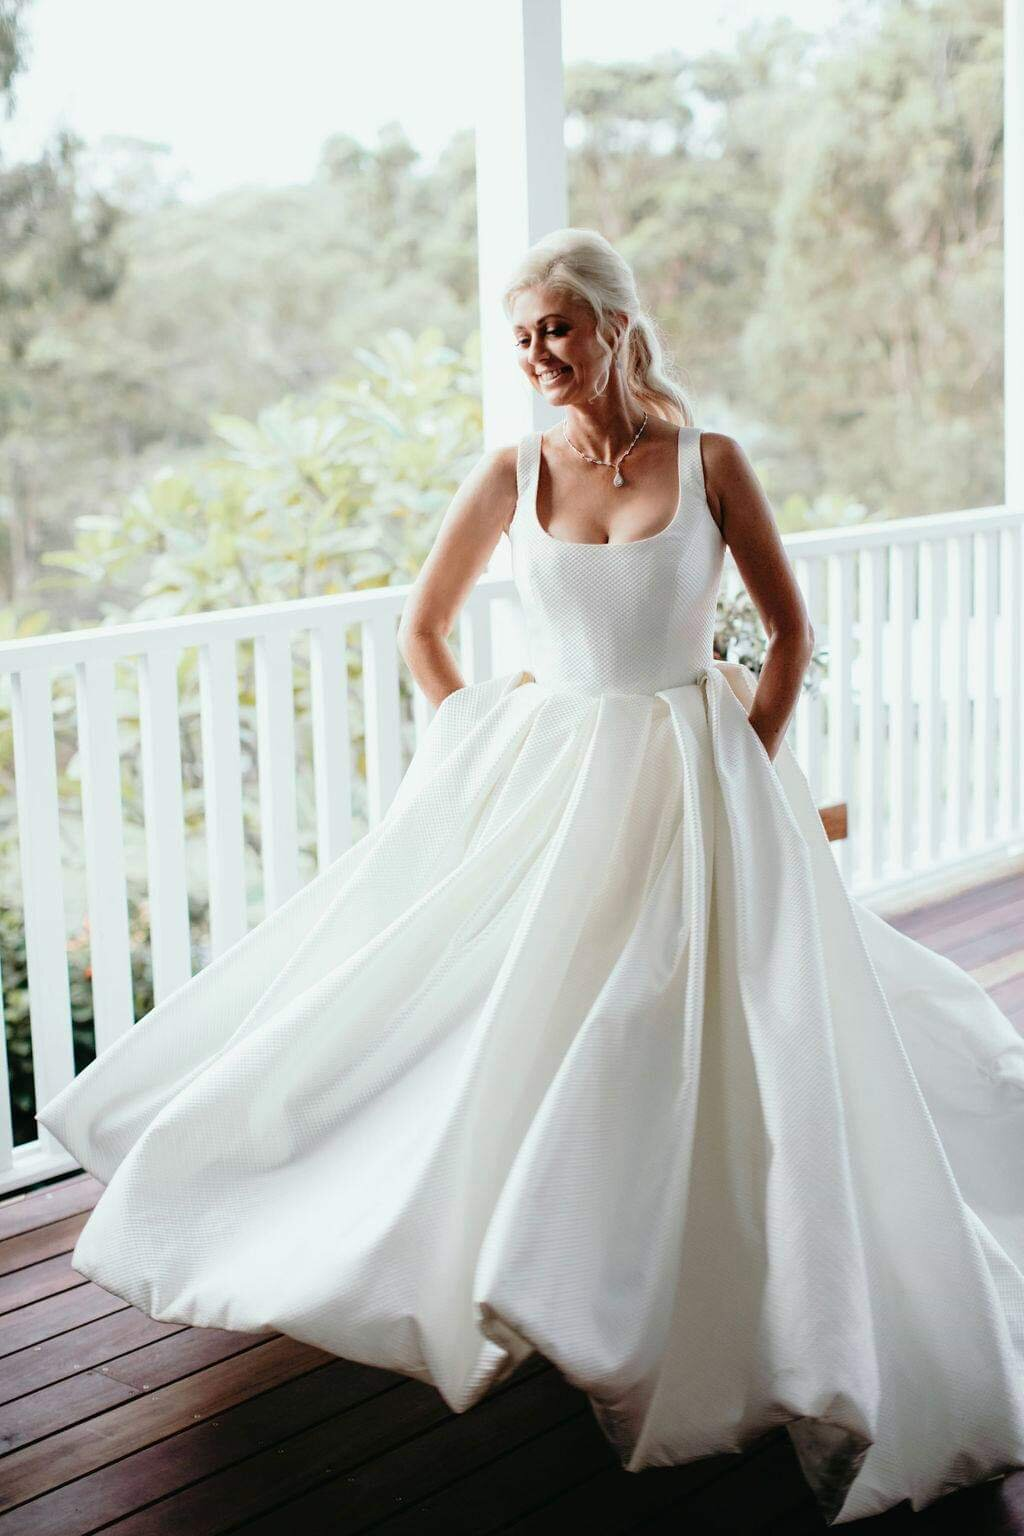 bespoke-bridal-shop-designer-helena-couture-designs-custom-wedding-dresses-gold-coast-brisbane-affordable-suzie12